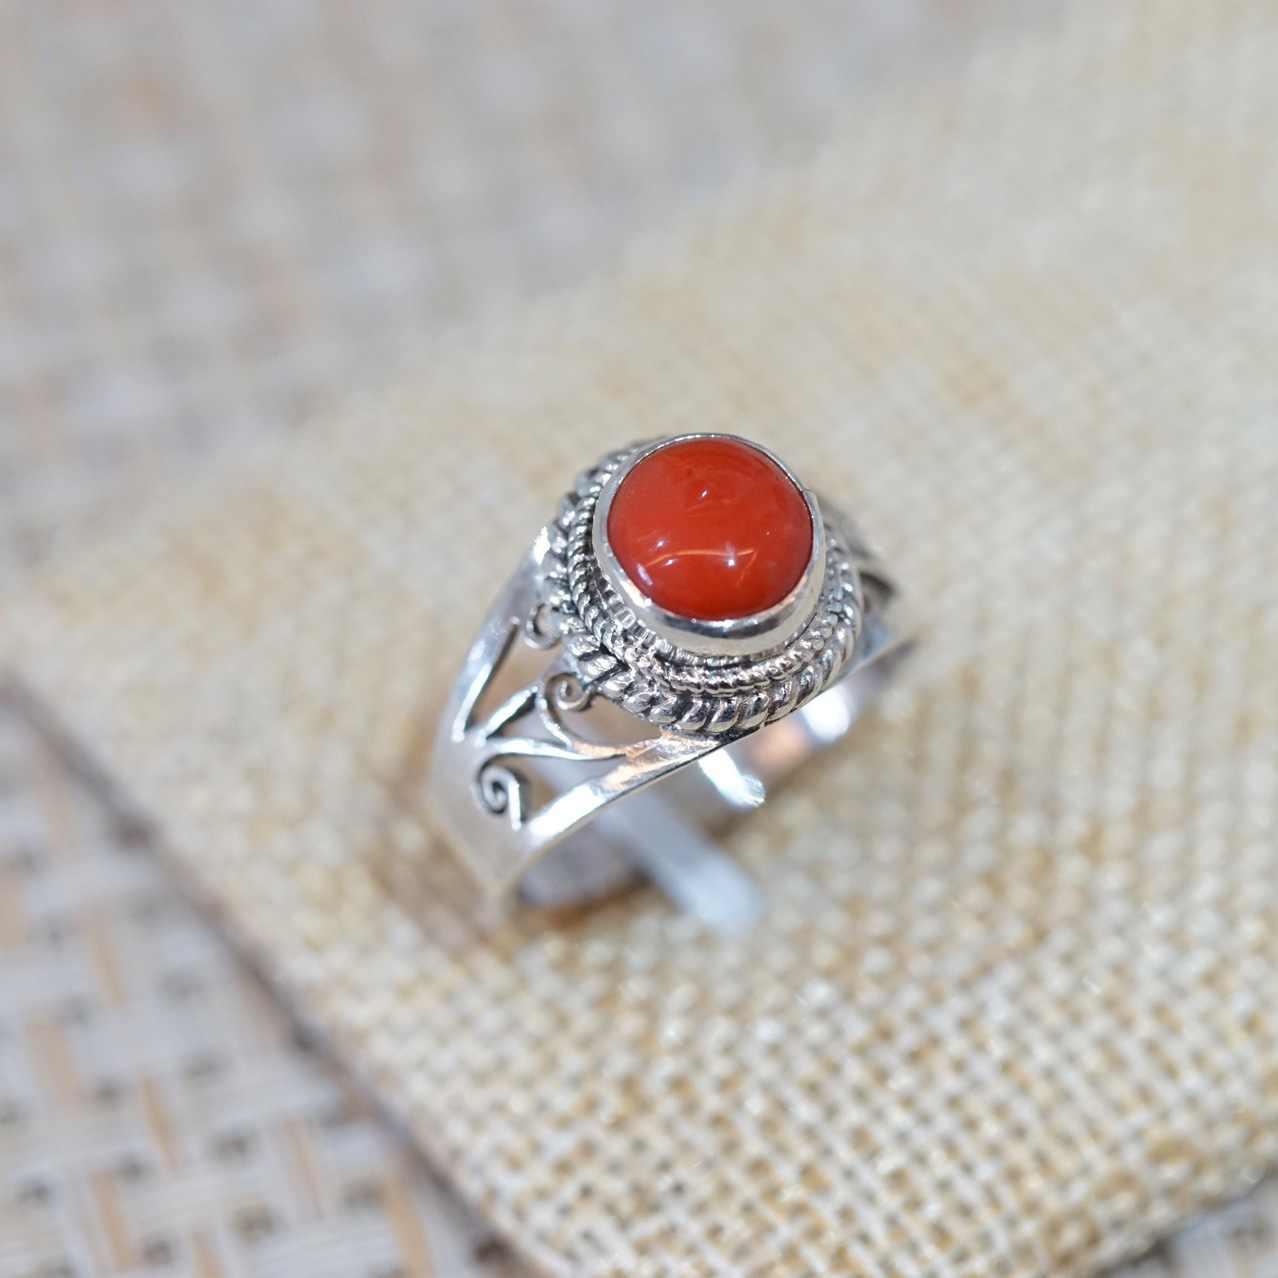 T9186 เนปาล 925 เงินฝังธรรมชาติ Coral แหวนแหวน